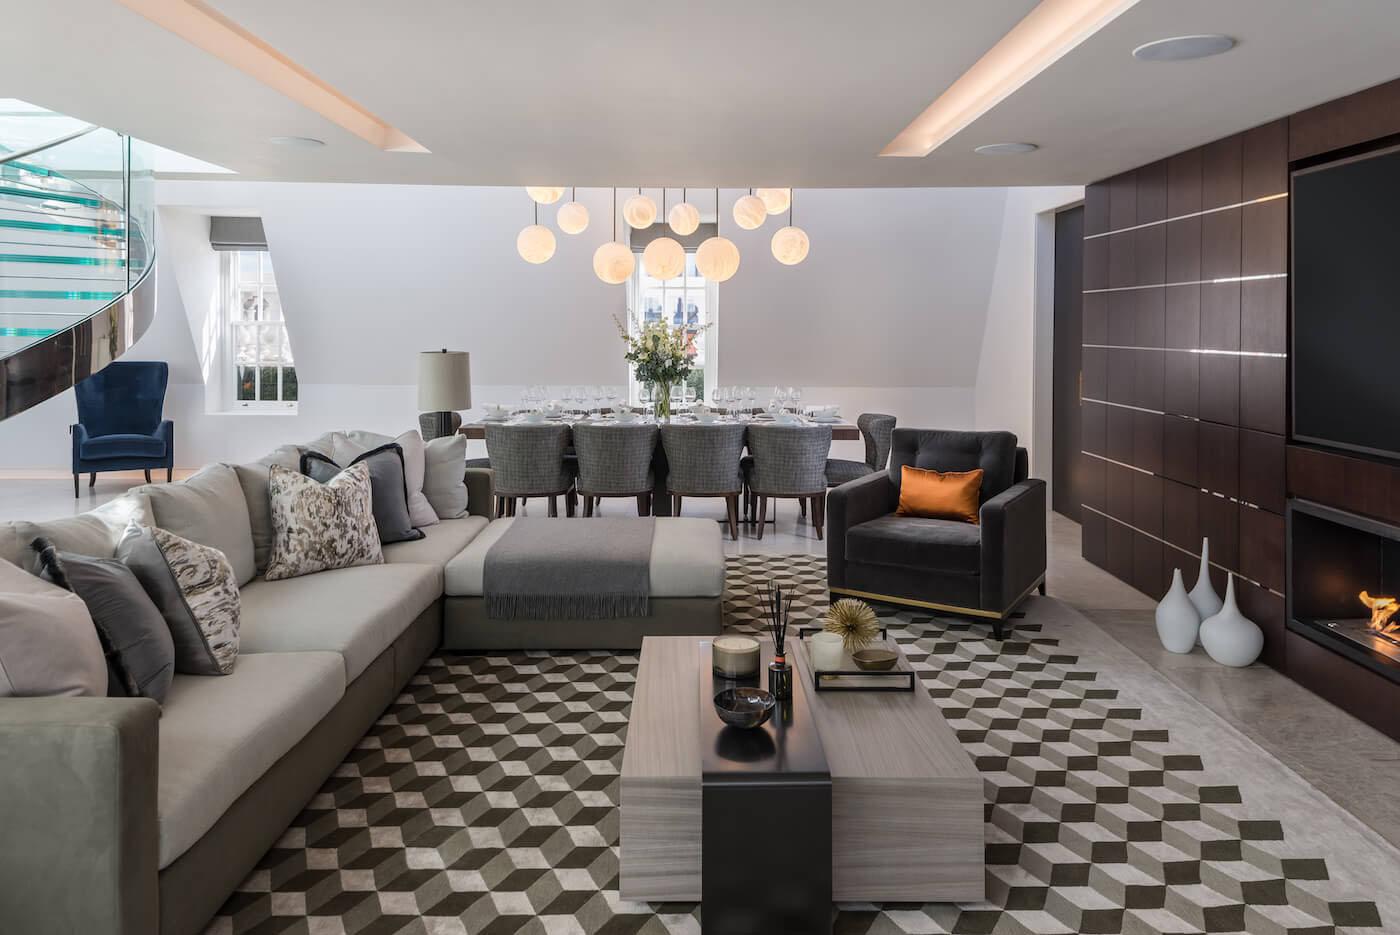 Mayfair House Luxury Penthouse Apartment London 4